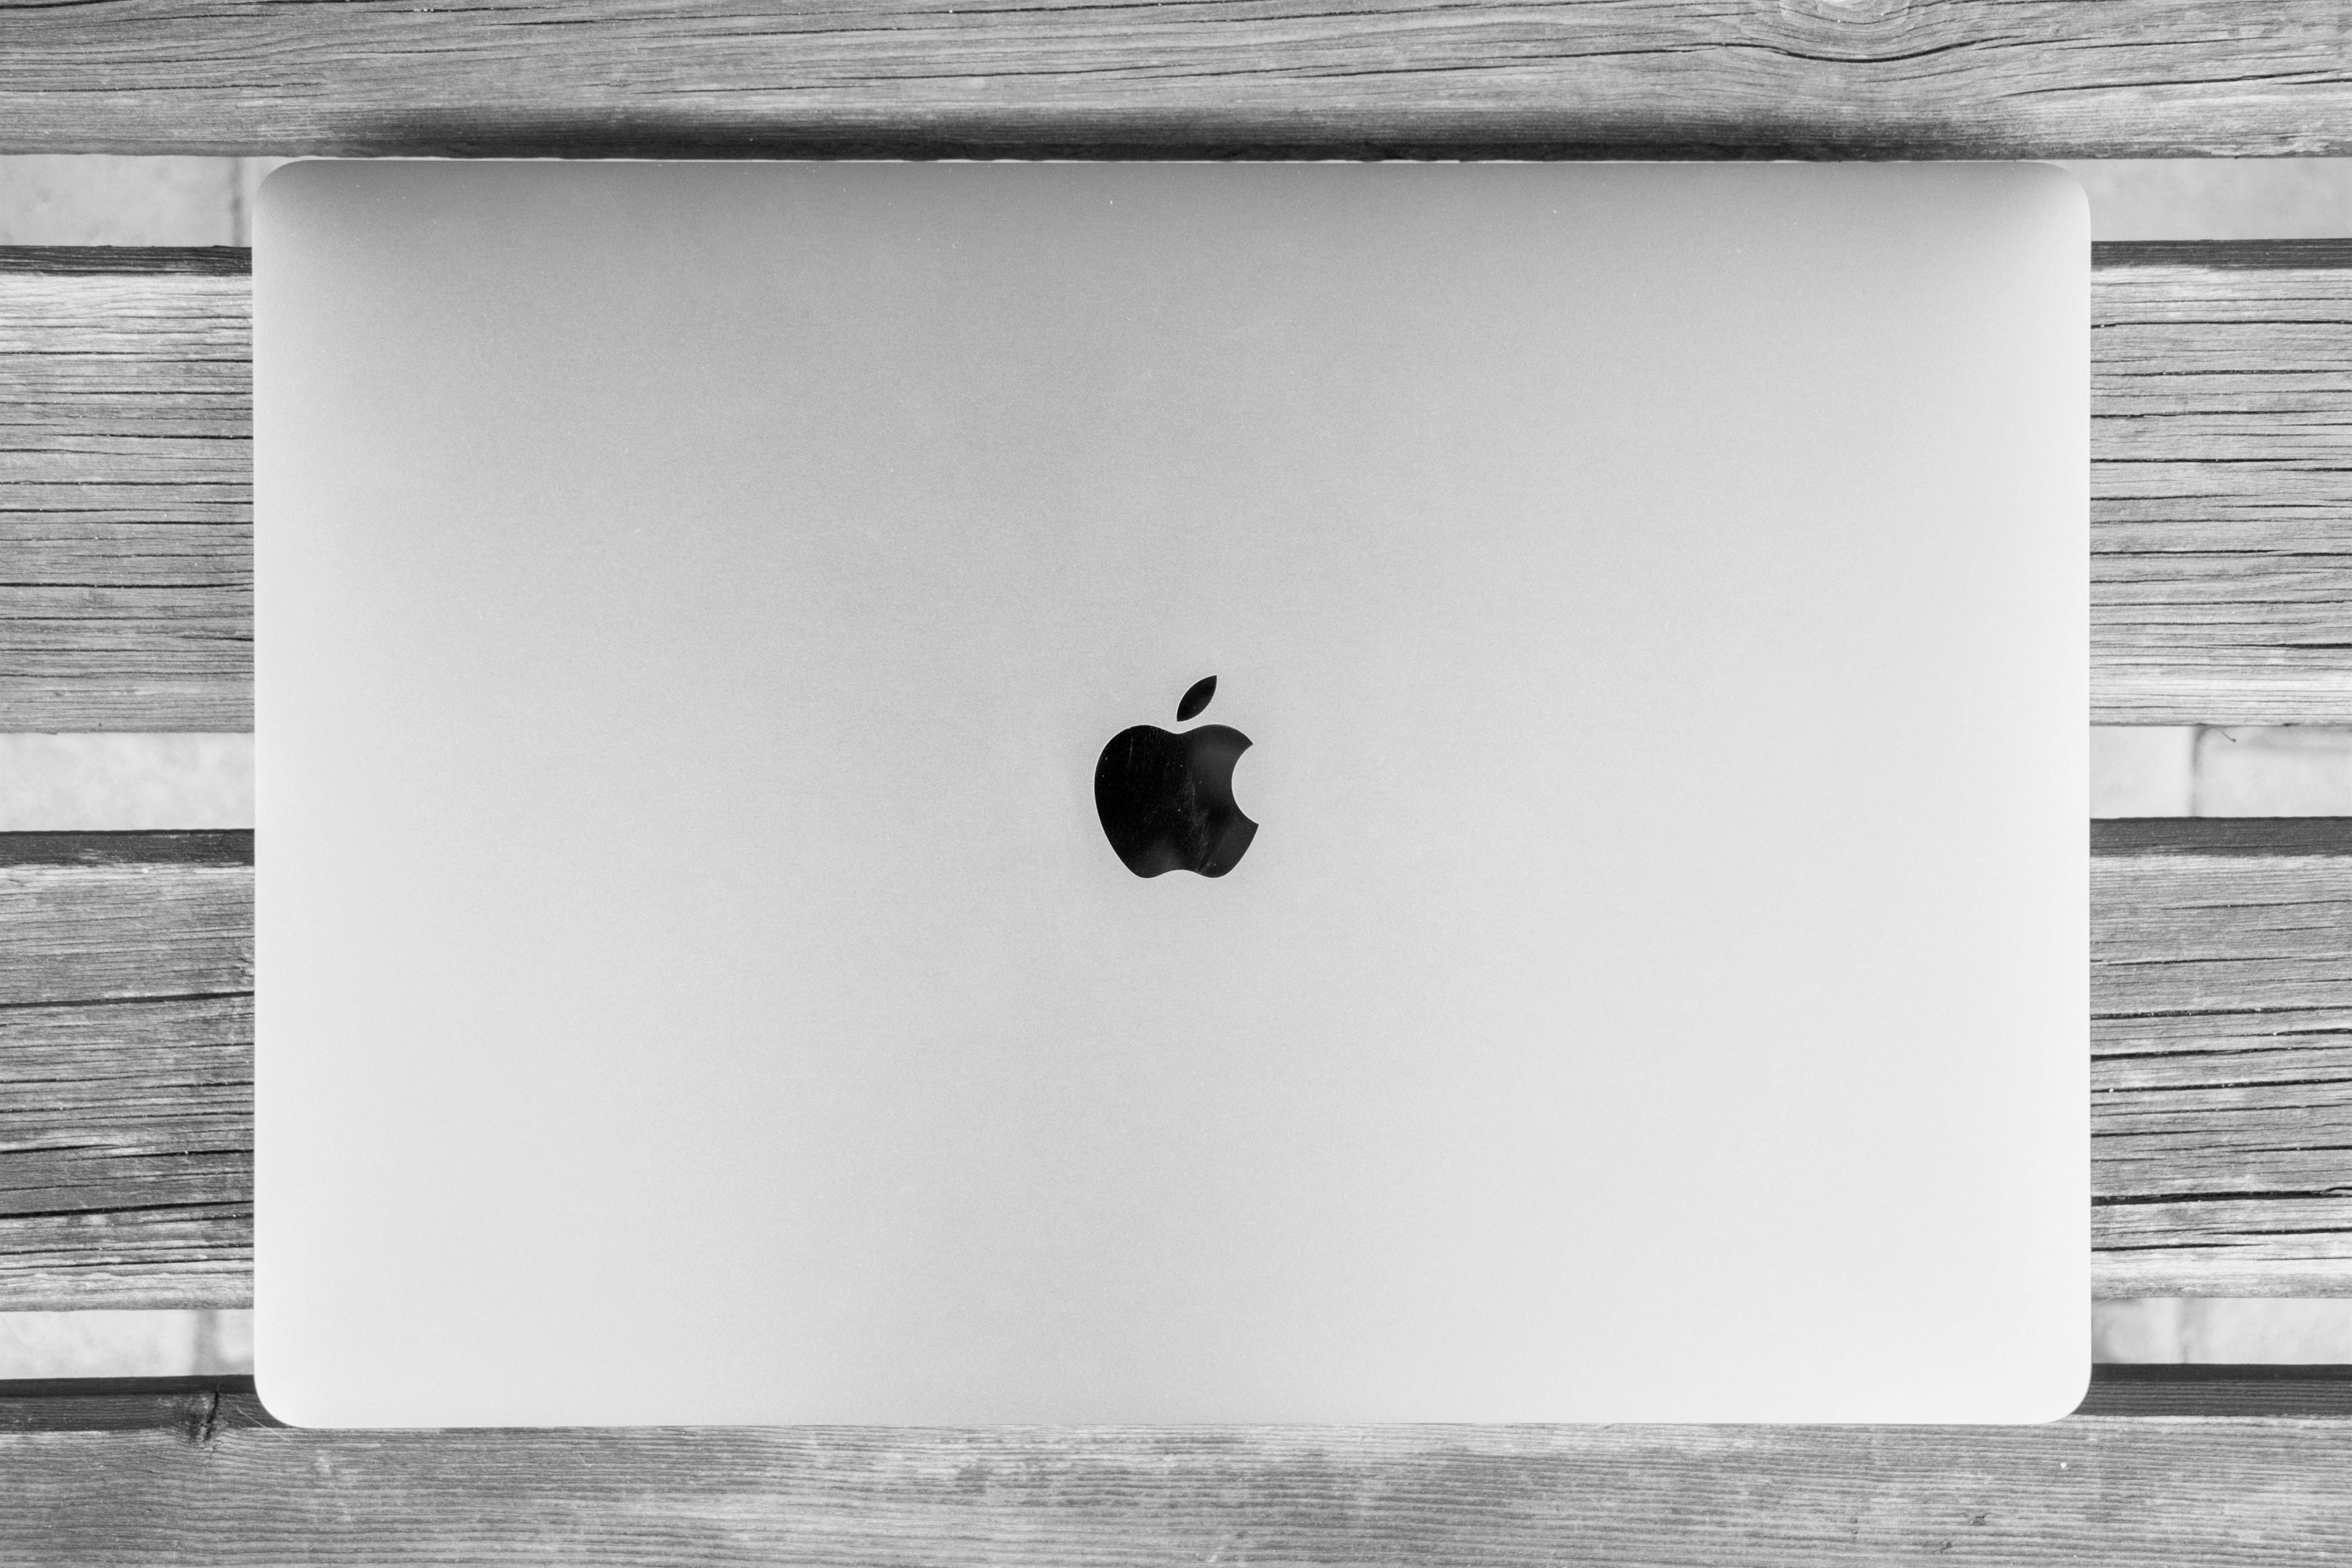 apple serial number vs imei